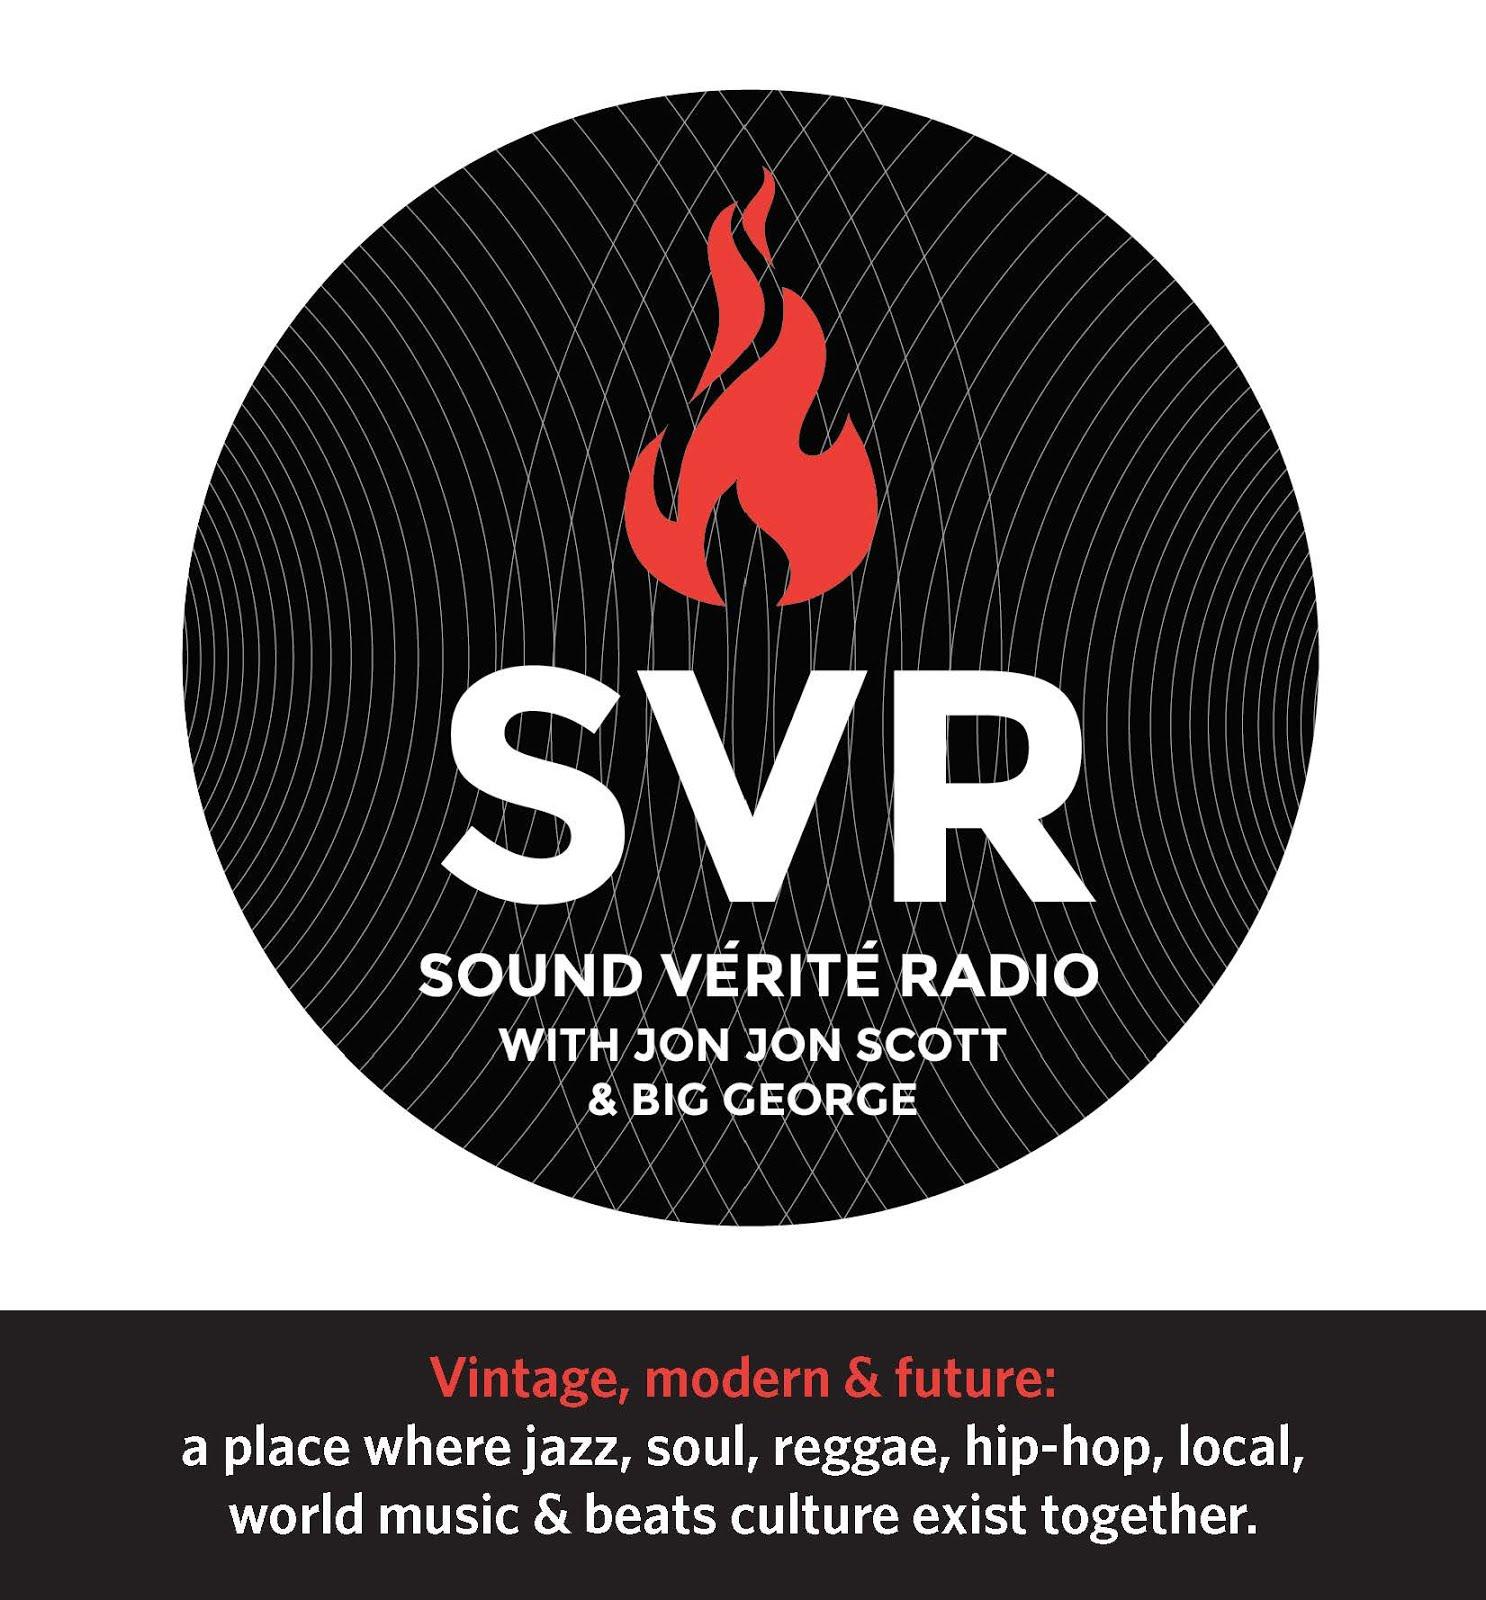 Sound Verite Radio